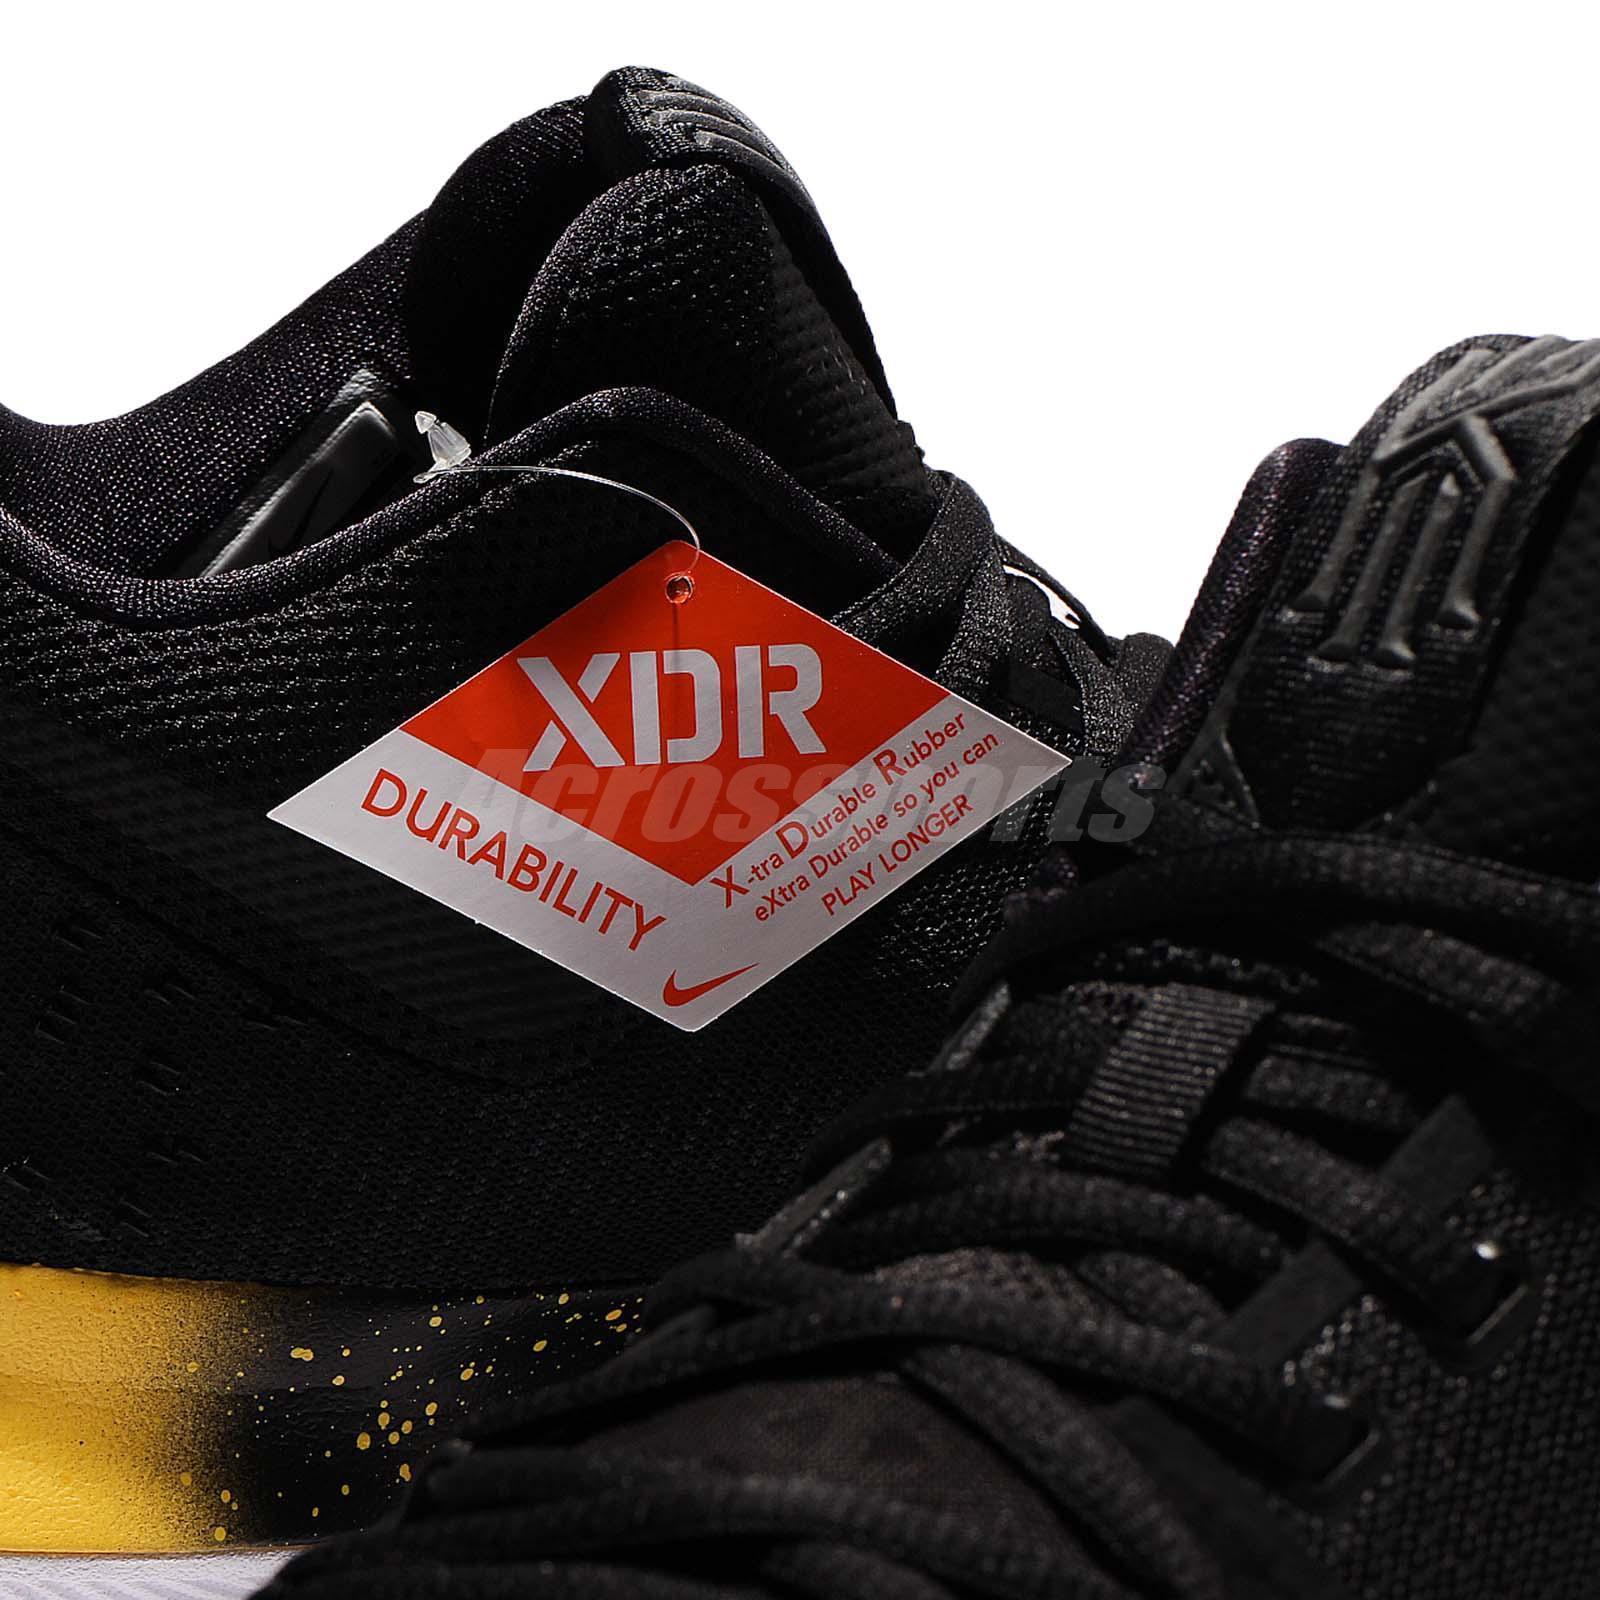 the best attitude c112b 856ae ... Ix Em Xdr Yellowgreen Teal Kobe 9 Elite Up To Nike Kyrie 3 – Black  Tour Yellow Oveerseas XDR ...